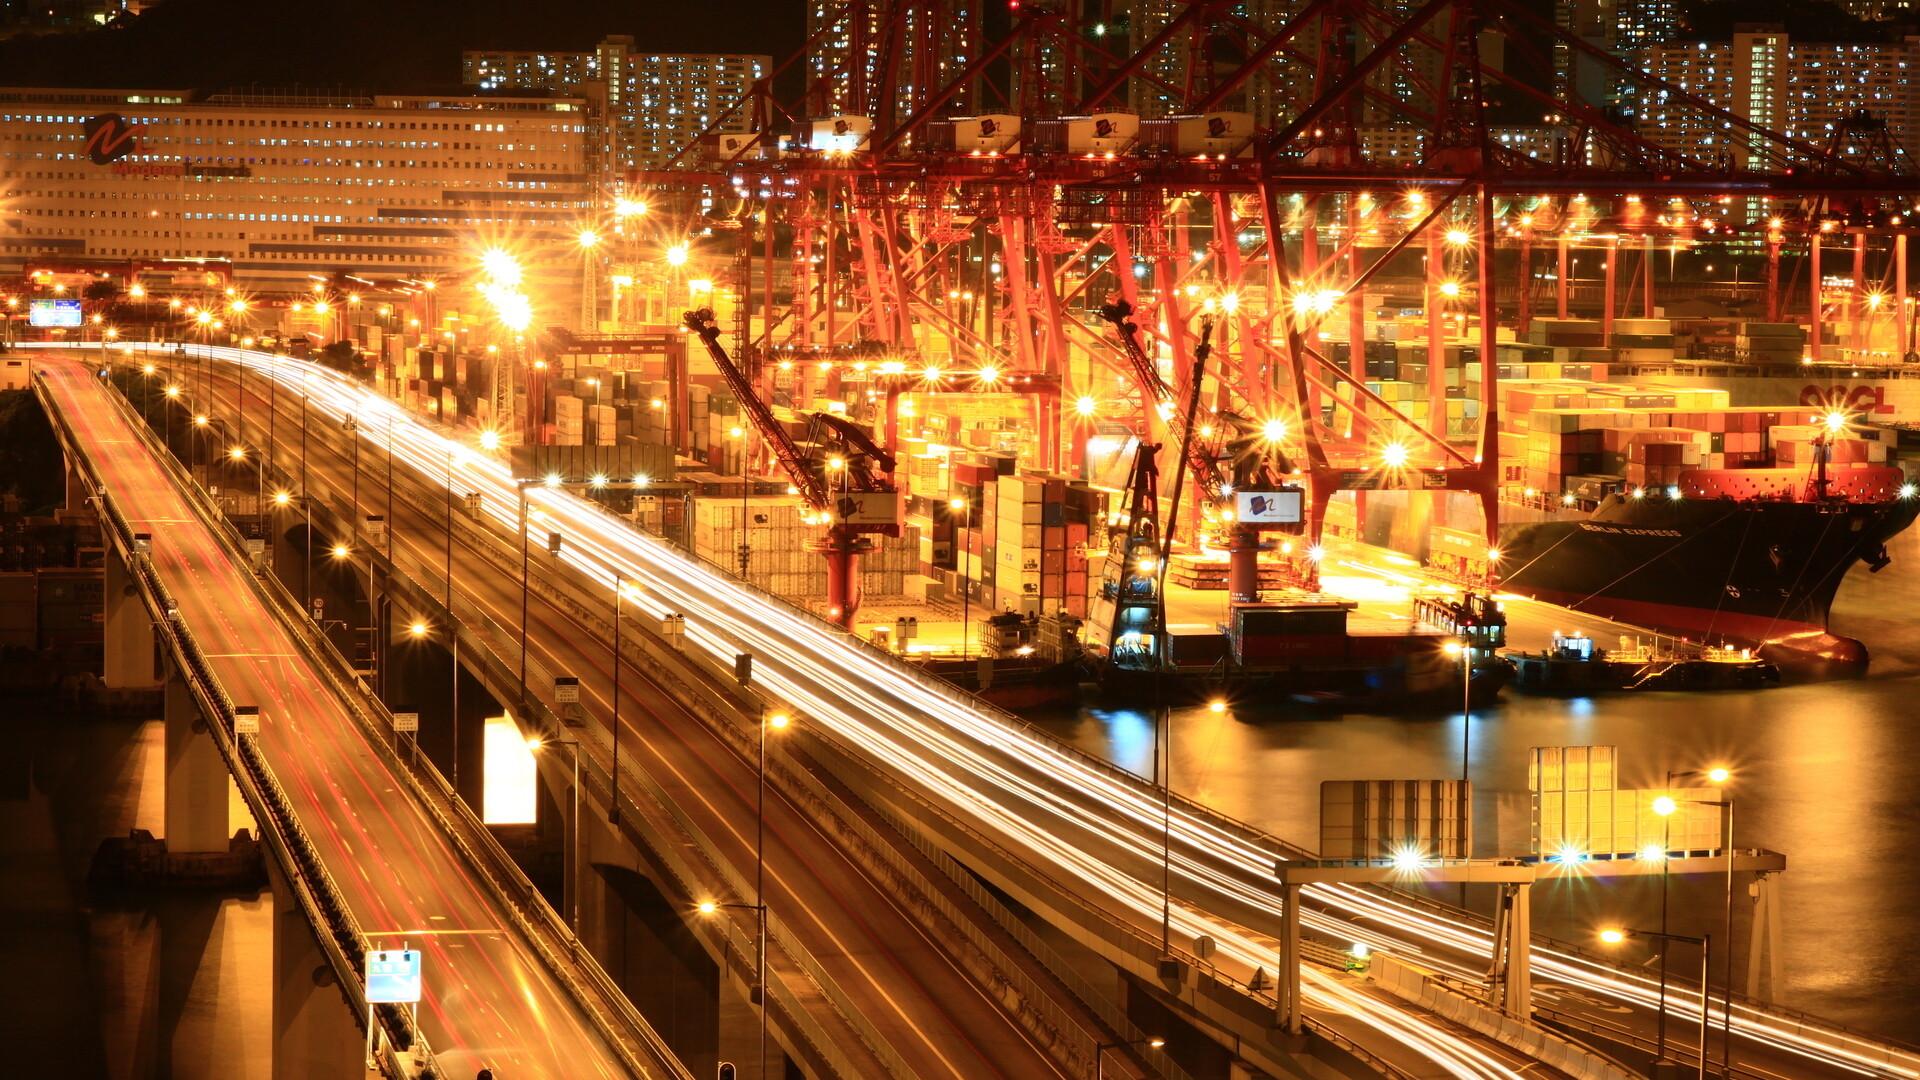 City/Dock/Harbor by night